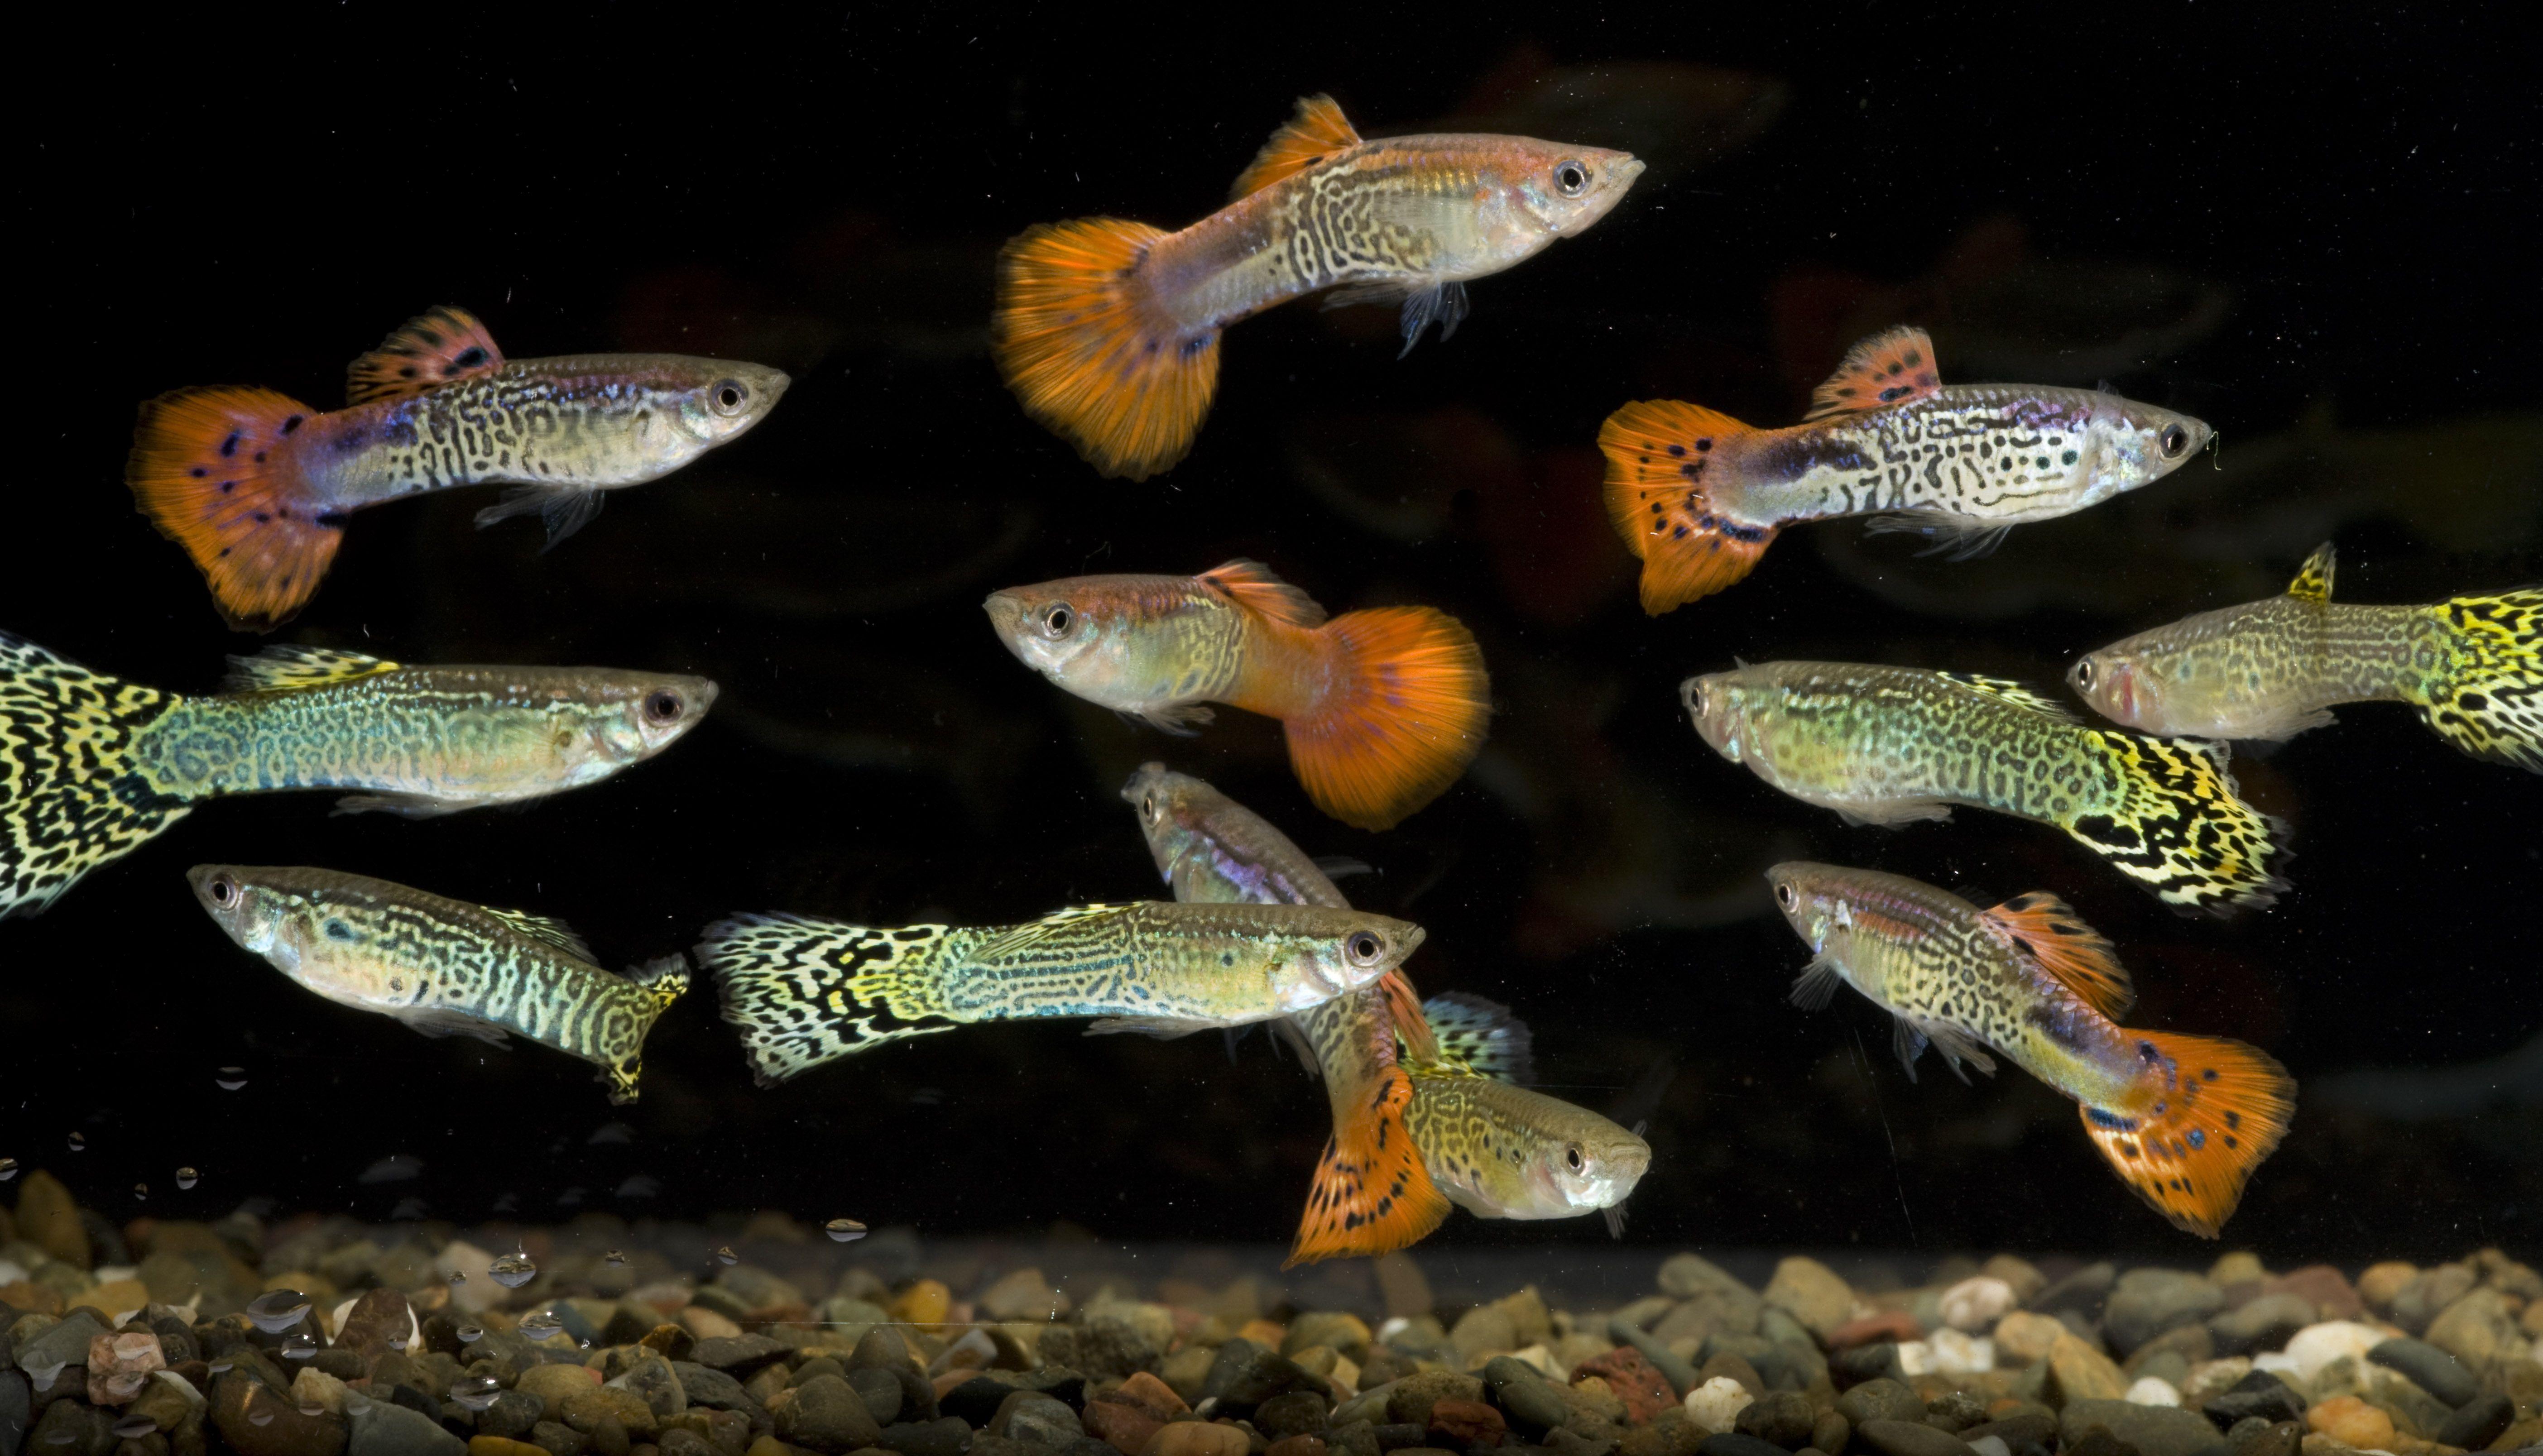 Freshwater aquarium fish silver with red fins - Red And Green Tinsel Guppies Aquariumindustries Christmas Fish Guppies Summer